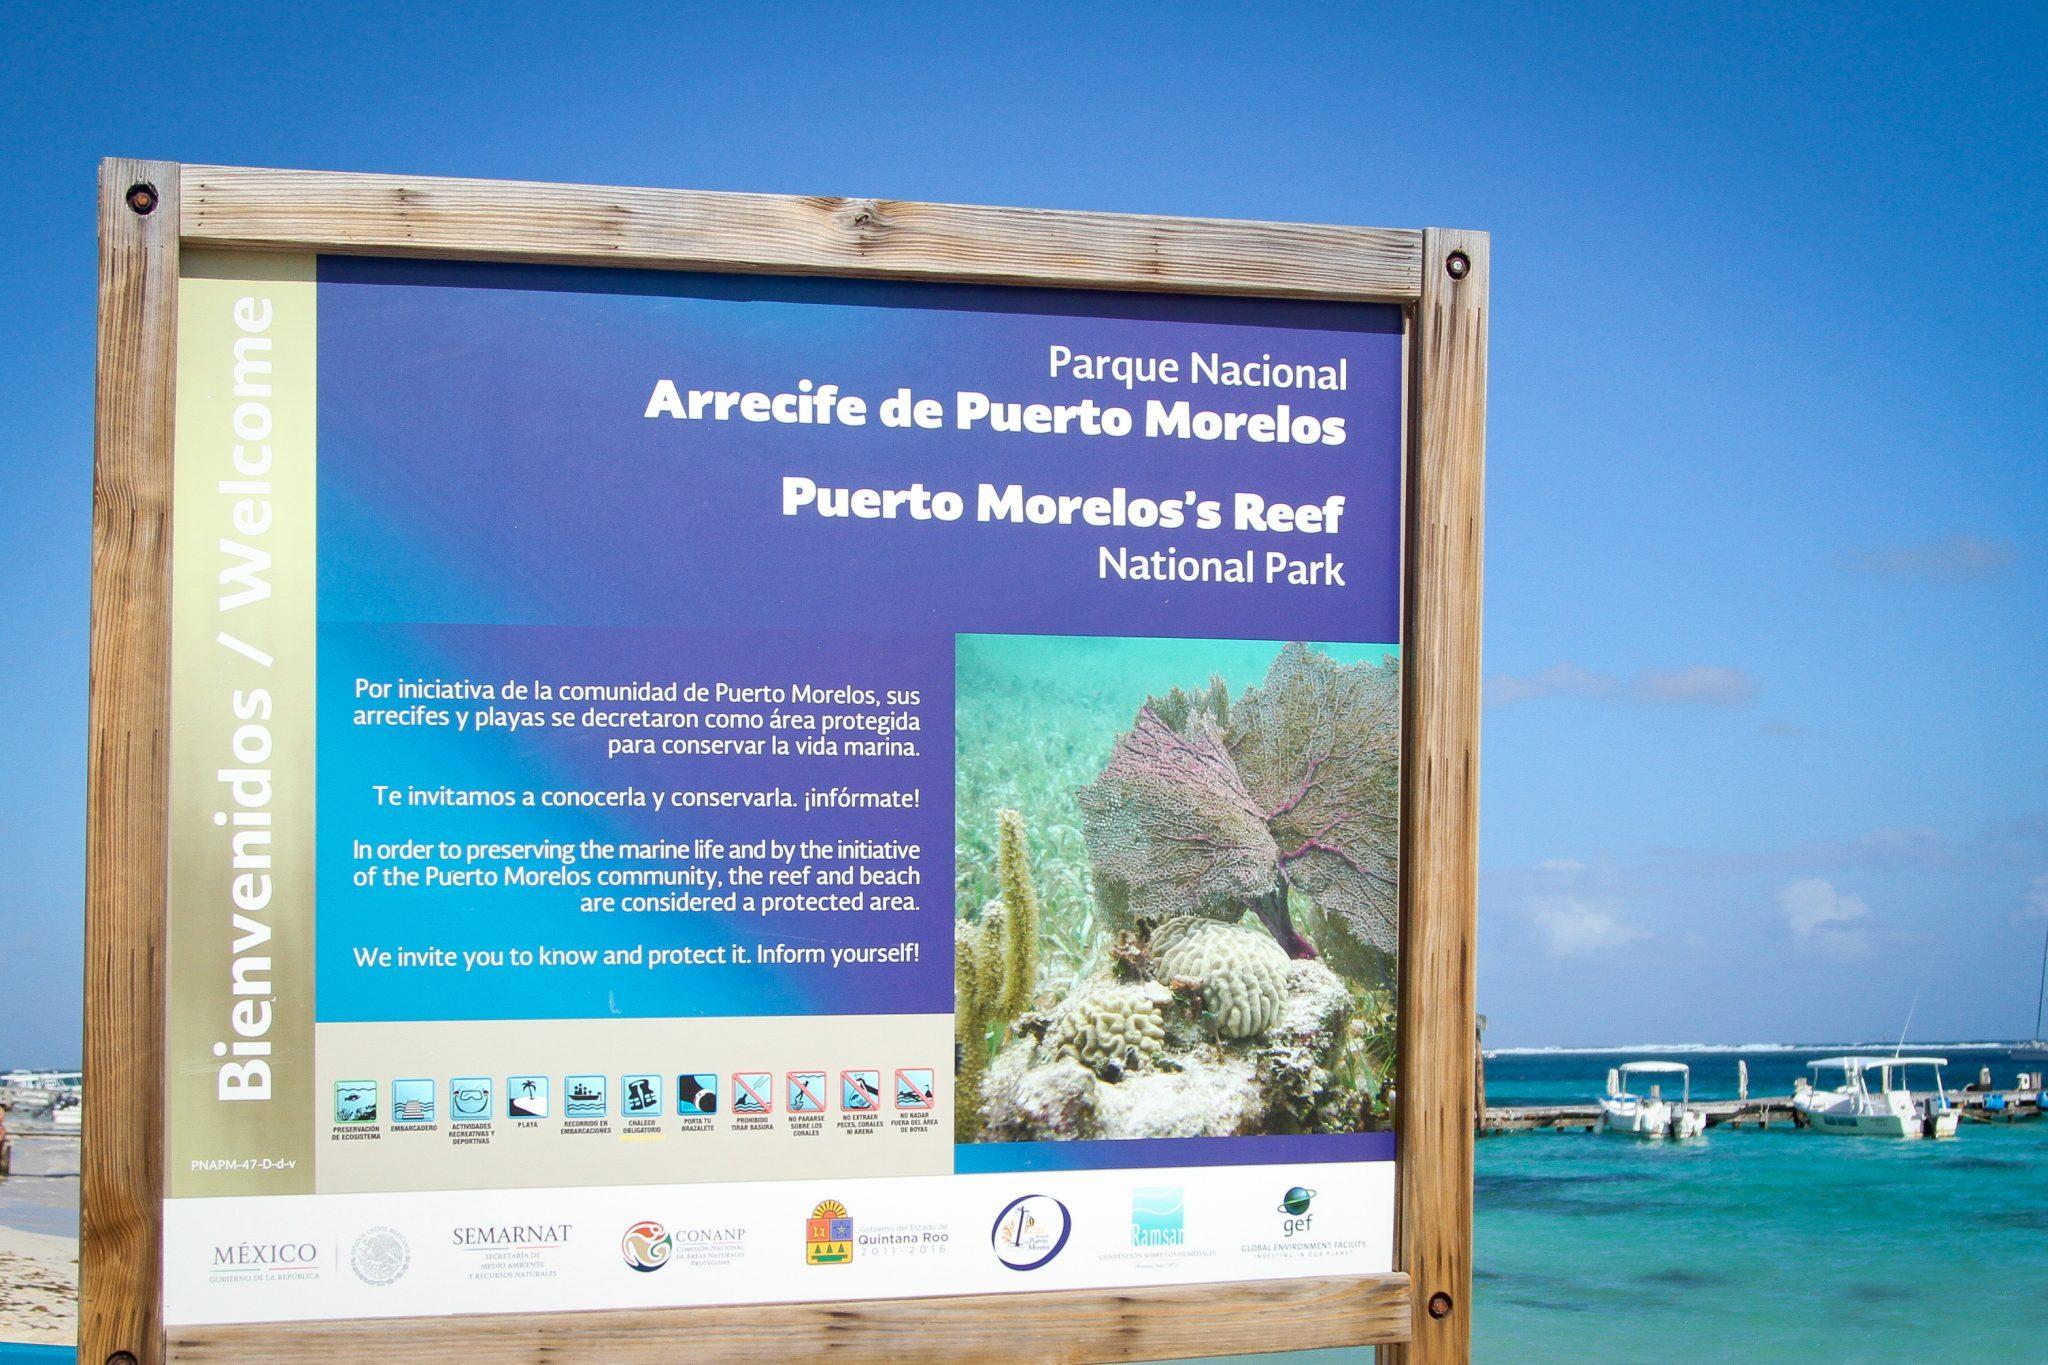 uerto Morelos Reef National Park